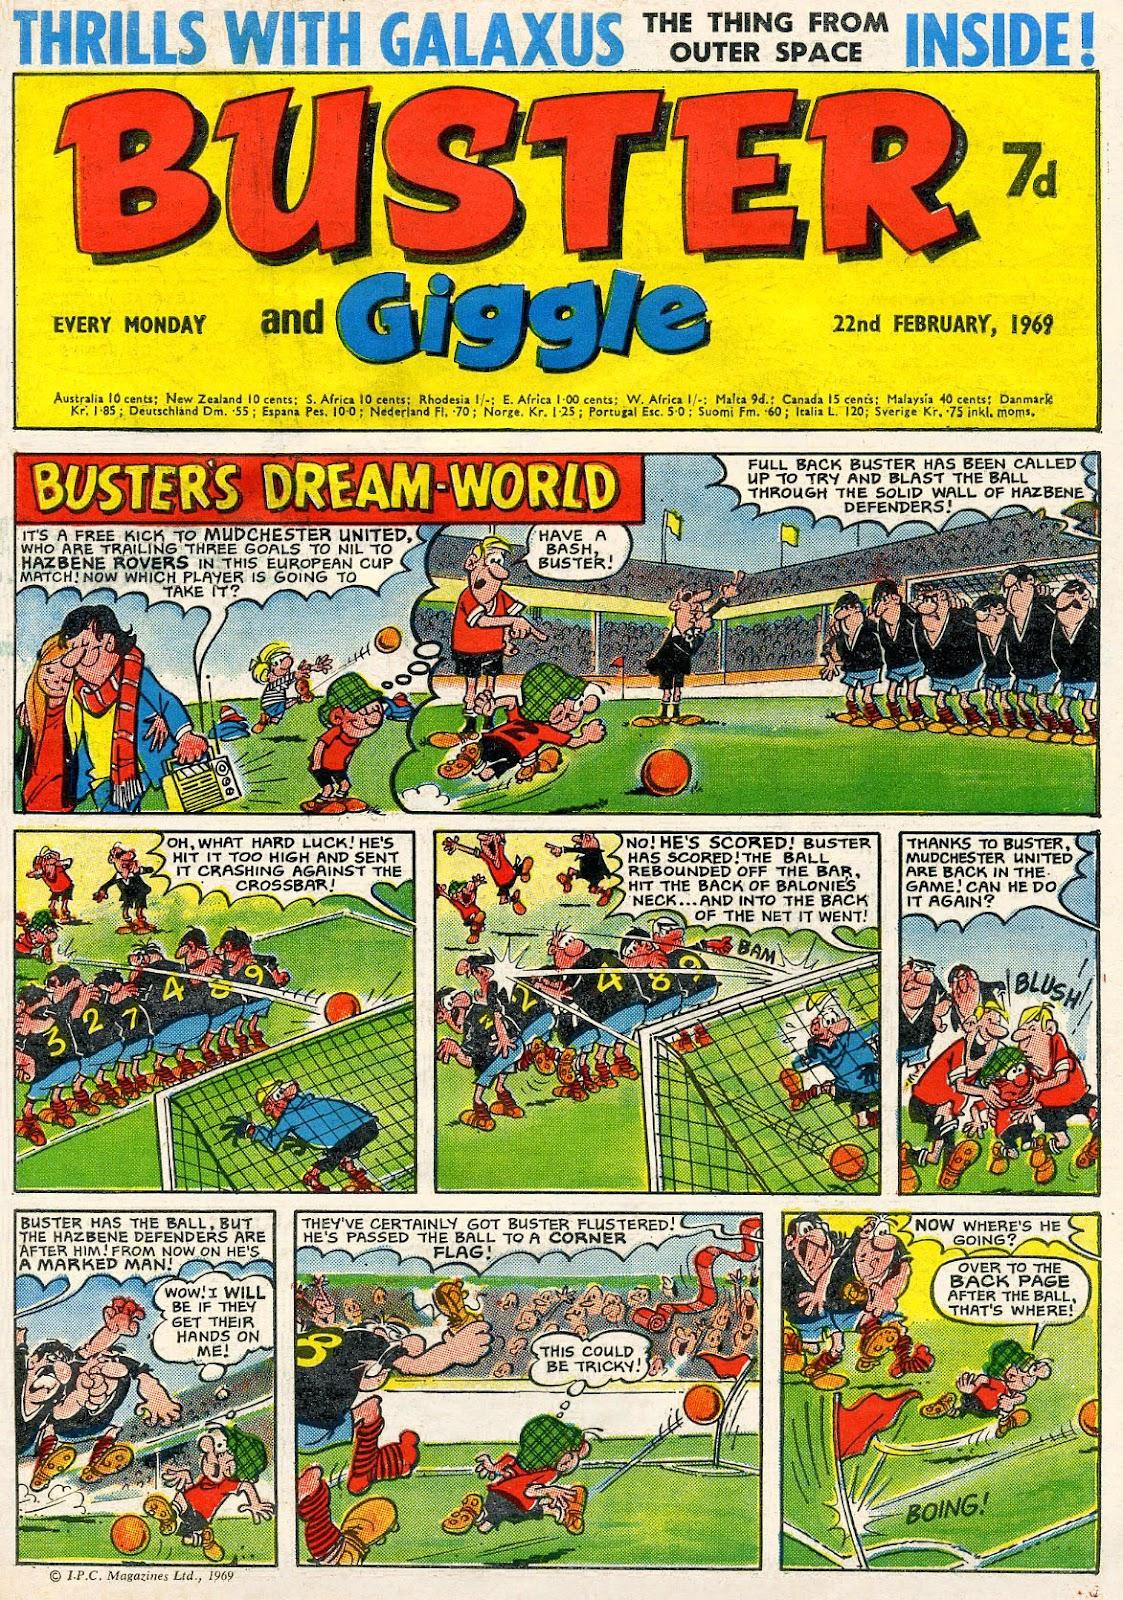 kazoop football theme in british humour comics